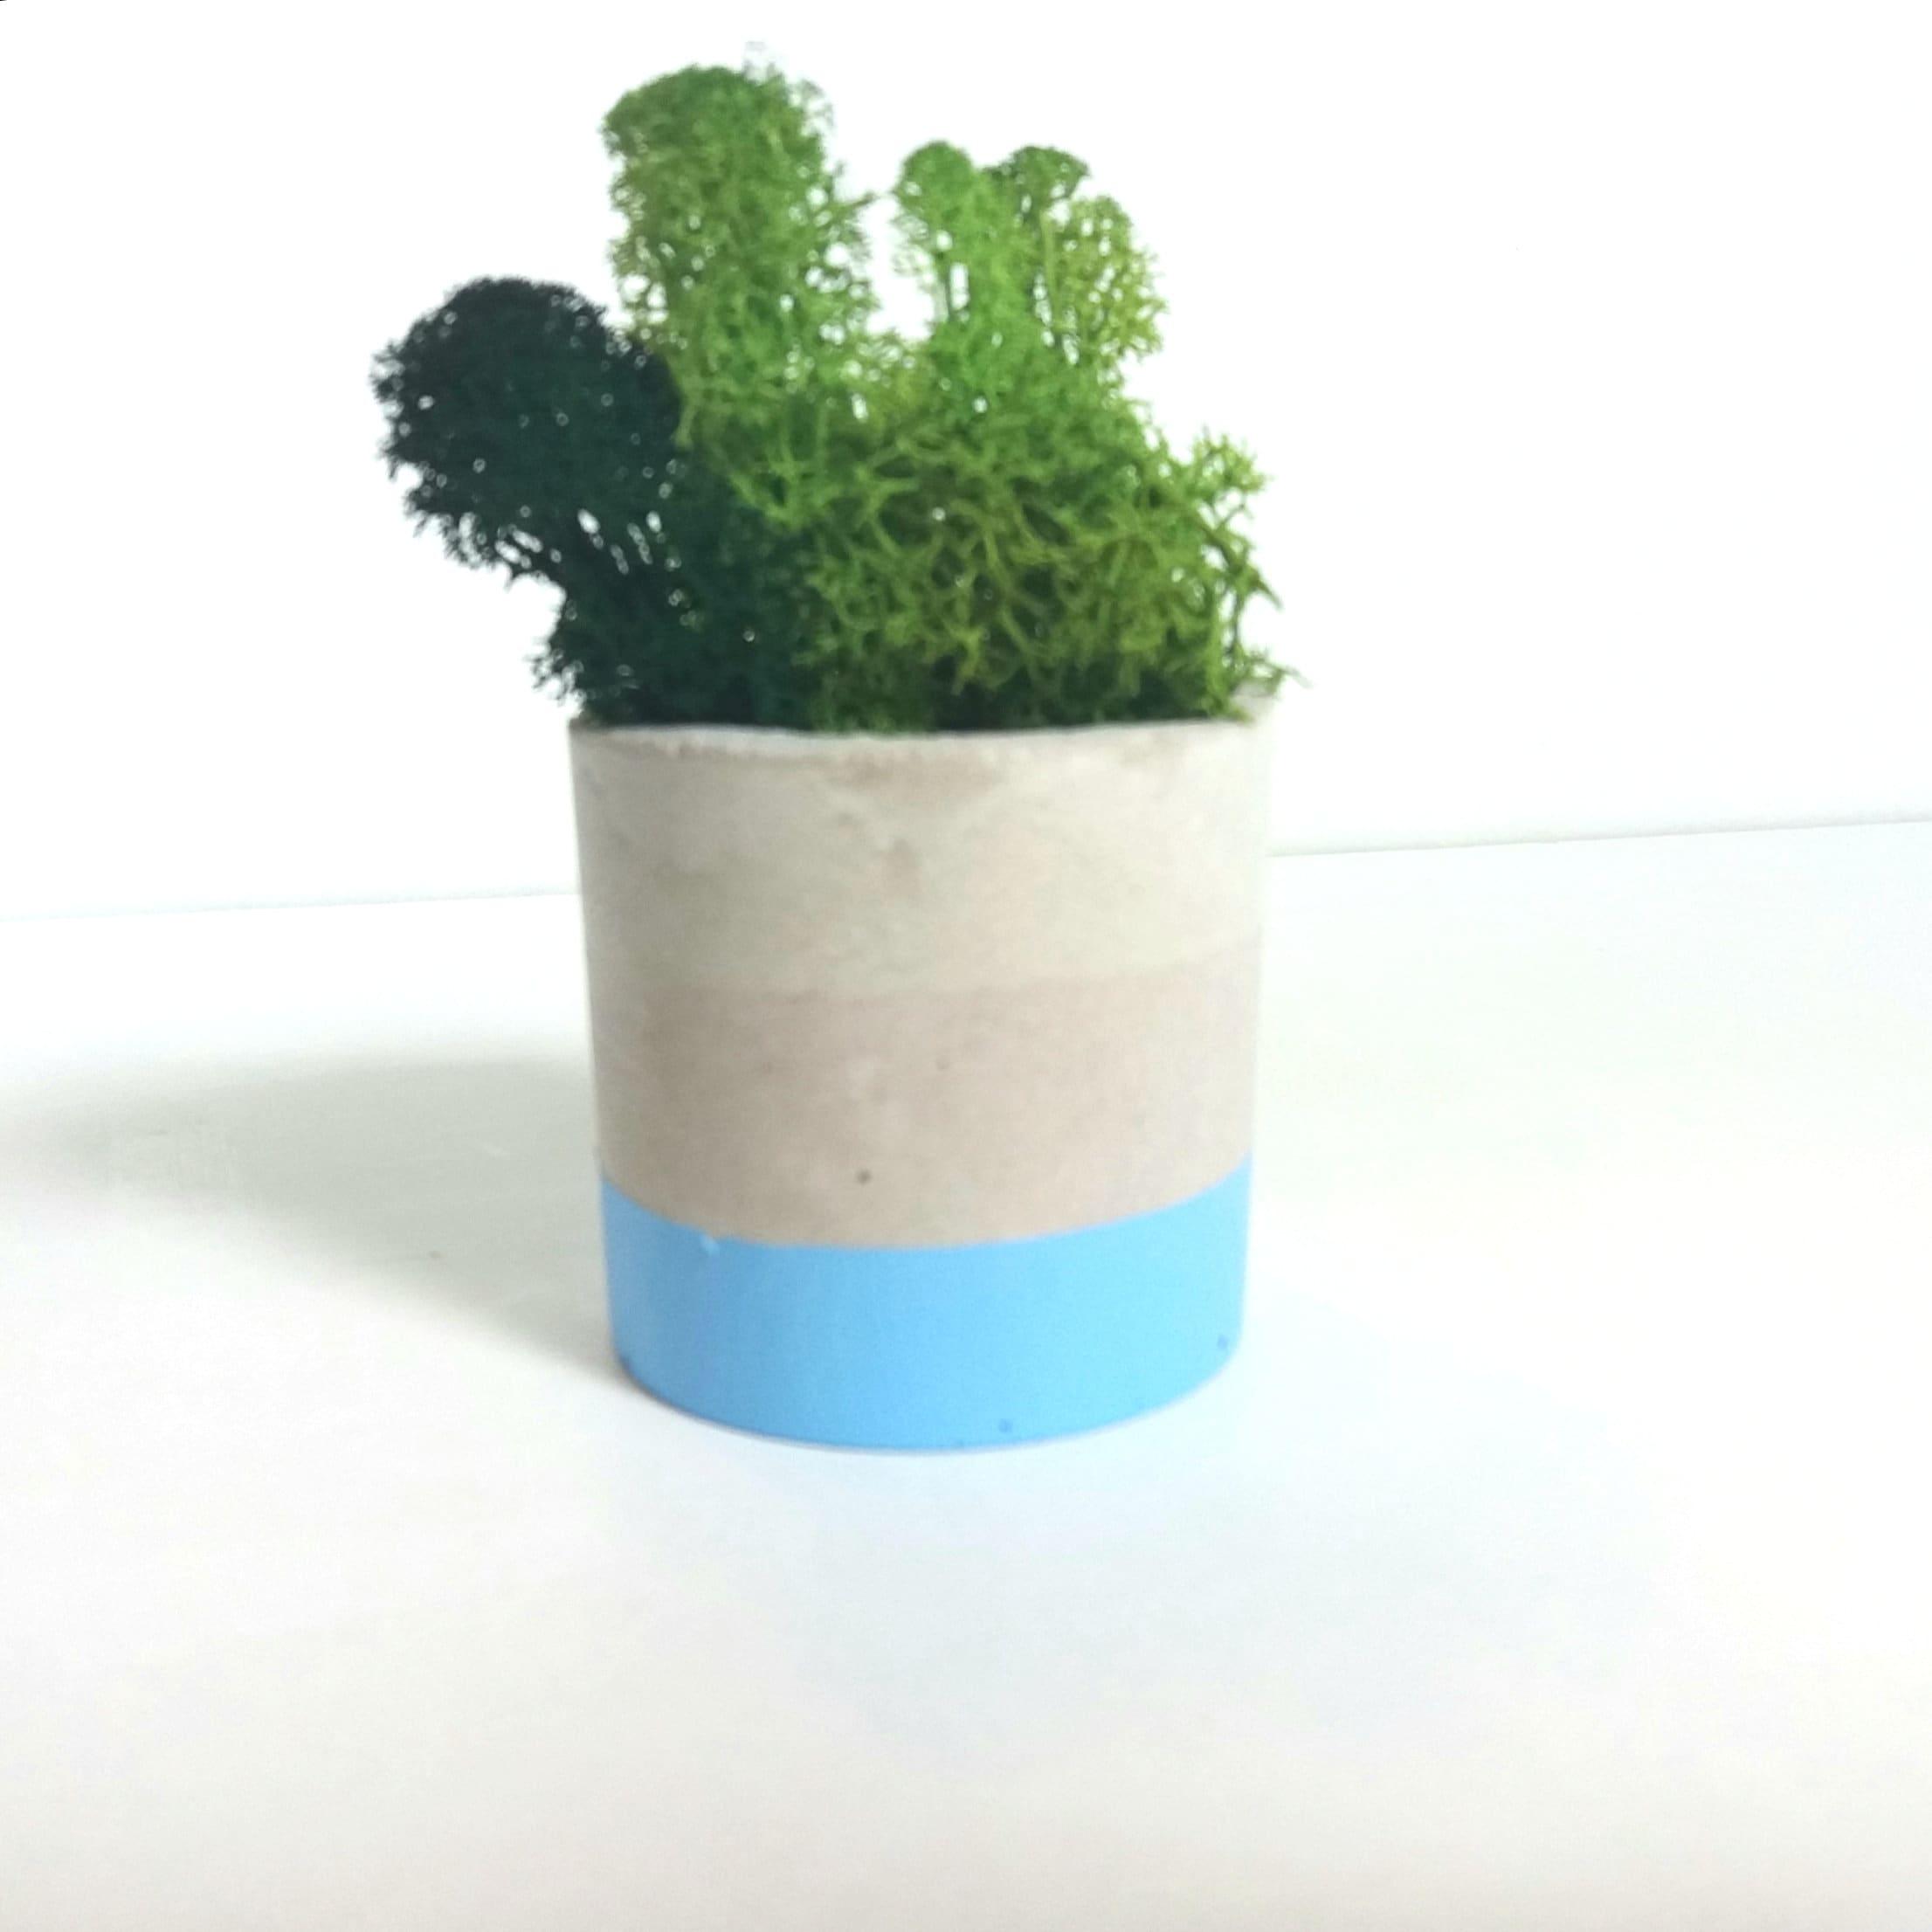 beton topf/beton luftpflanze halter/beton pflanzer / saftig | etsy